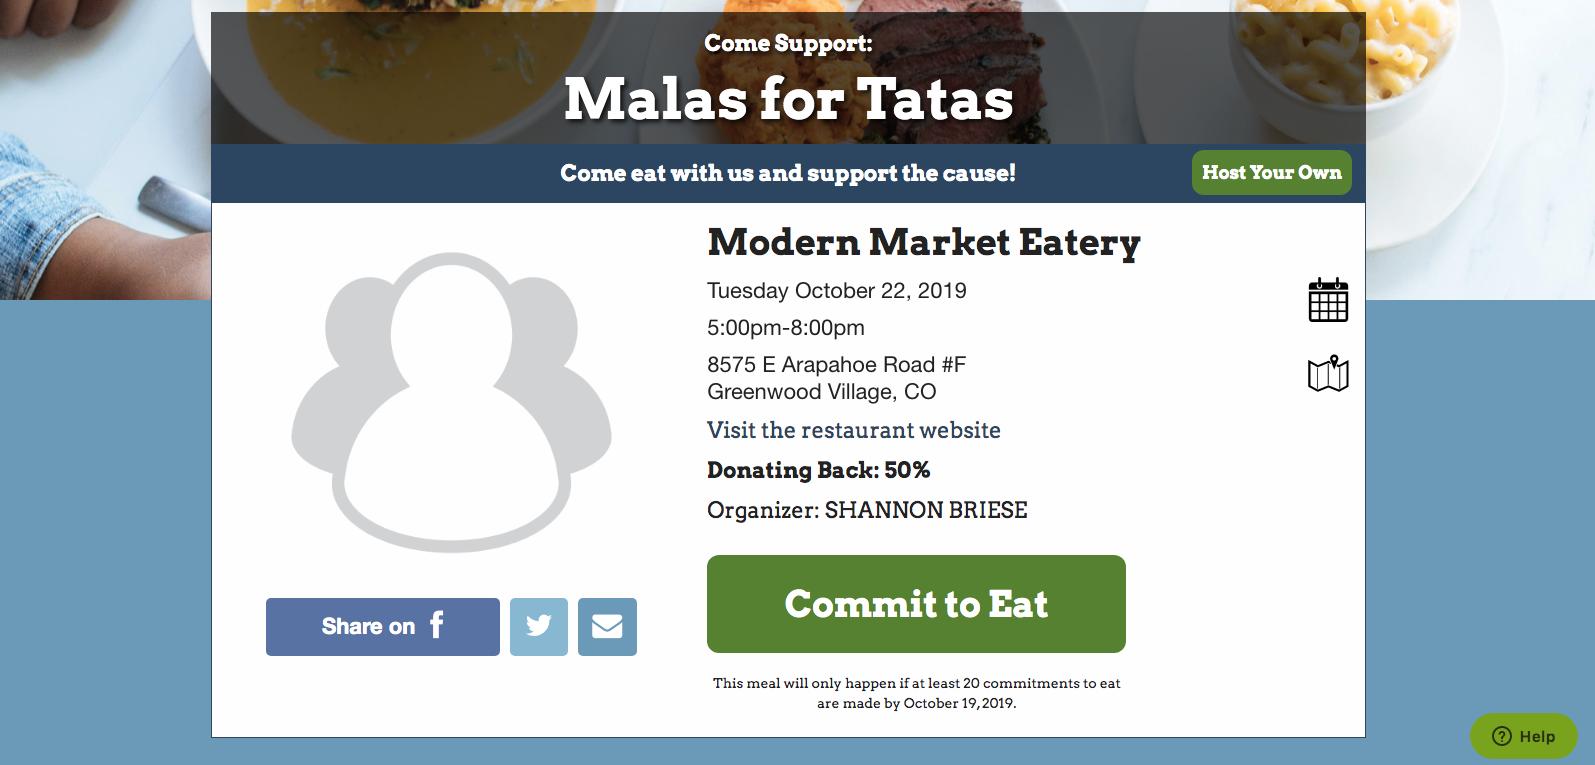 Malas for Tatas Modern Market Eatery, Greenwood Village CO